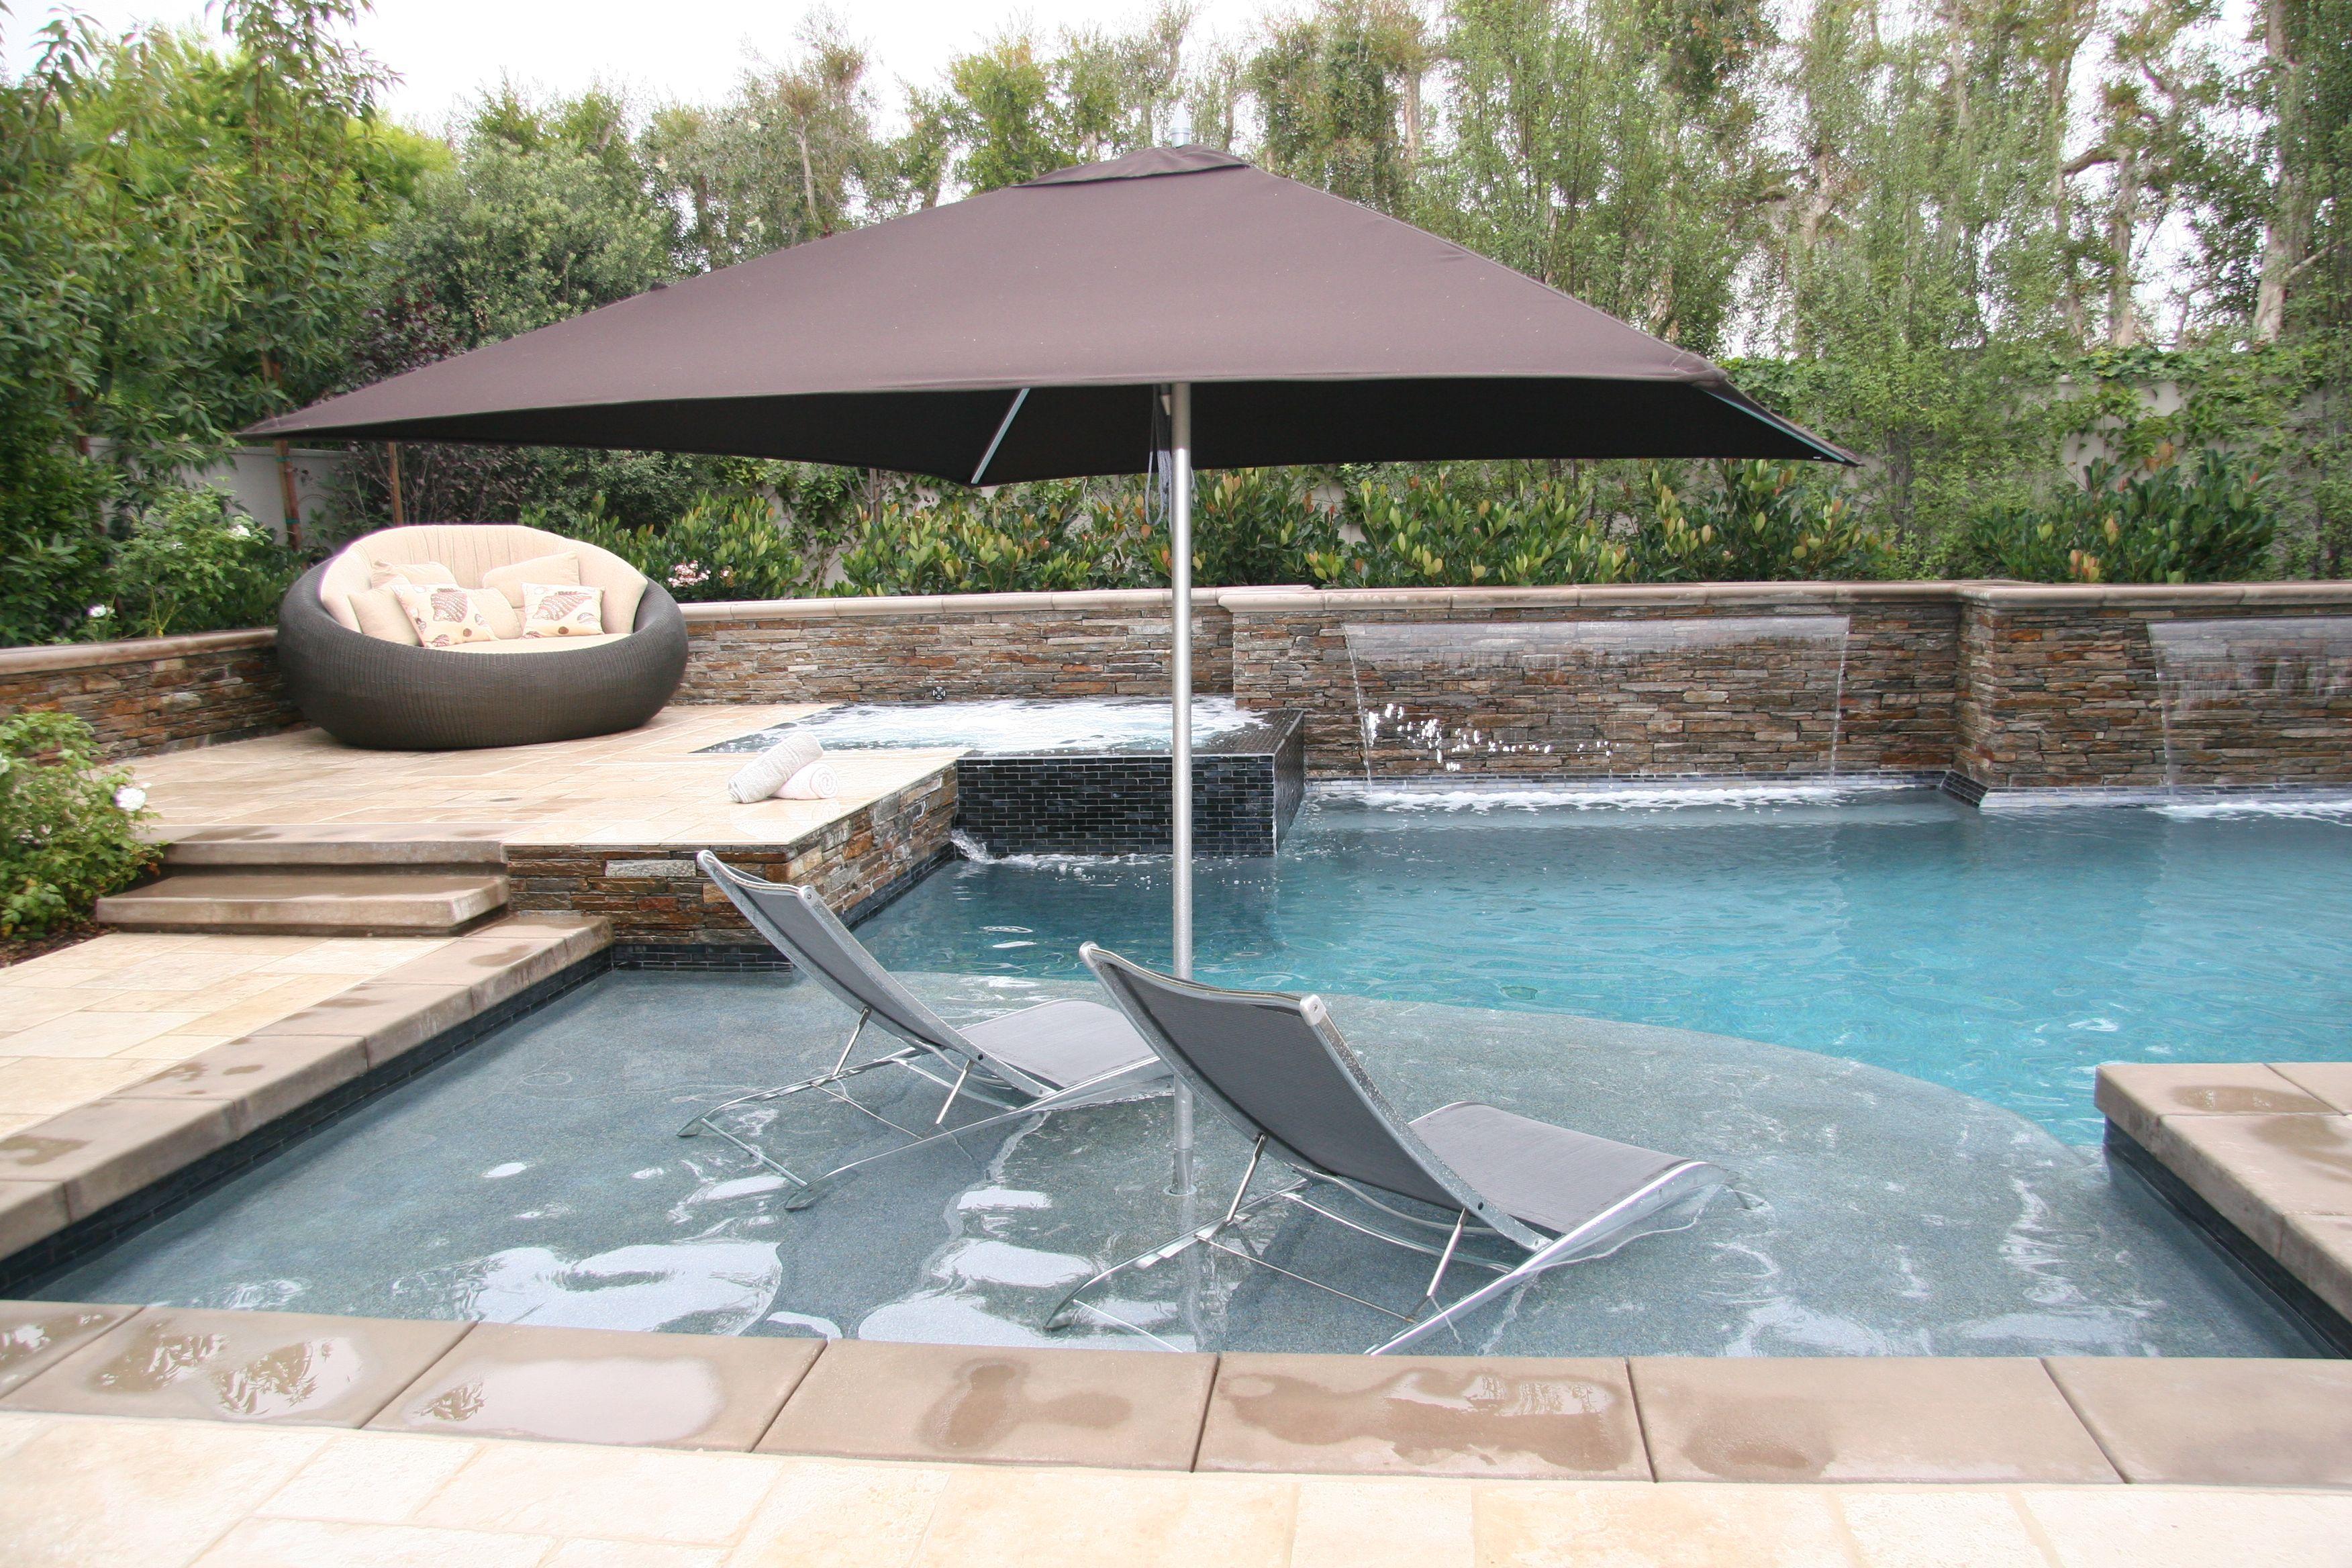 Baja Beach Chairs Wrought Iron Chair Glides Lounge And Umbrella On Shelf Cardin